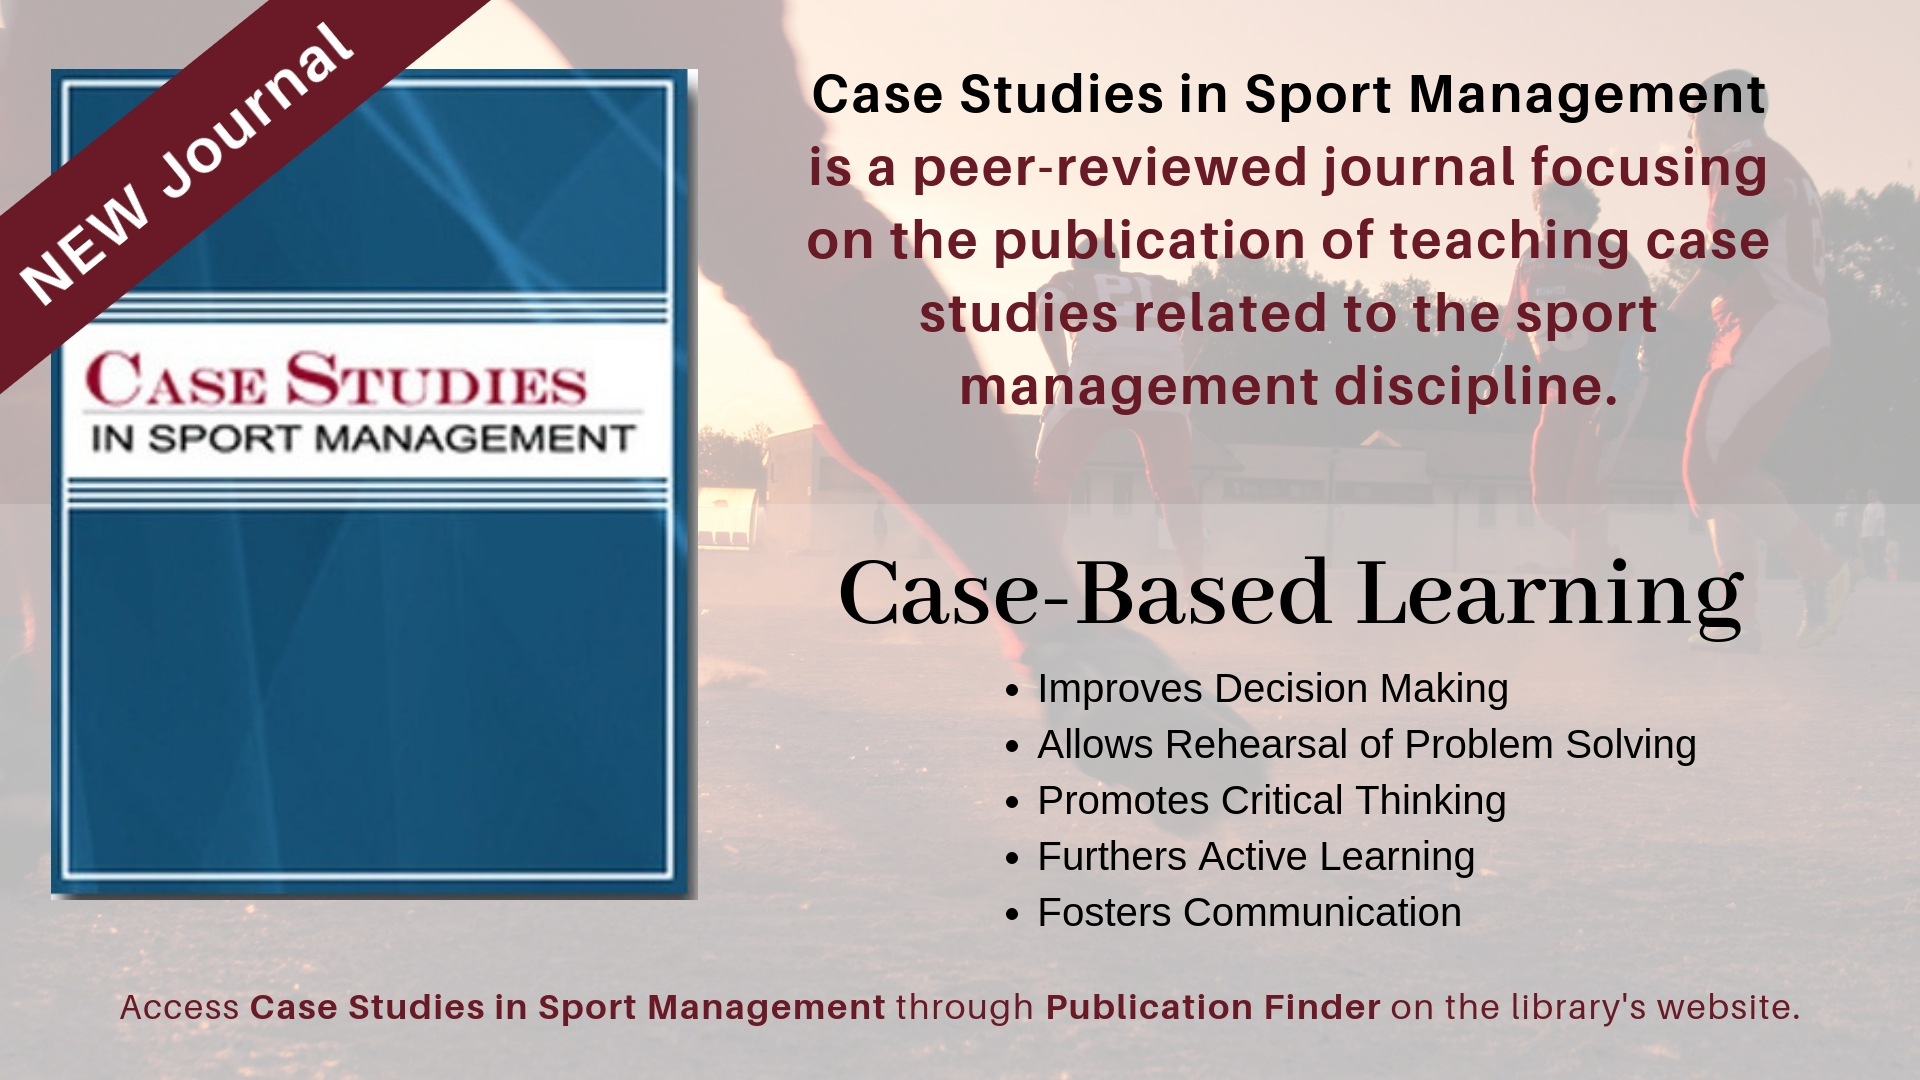 New Journal: Case Studies in Sport Management